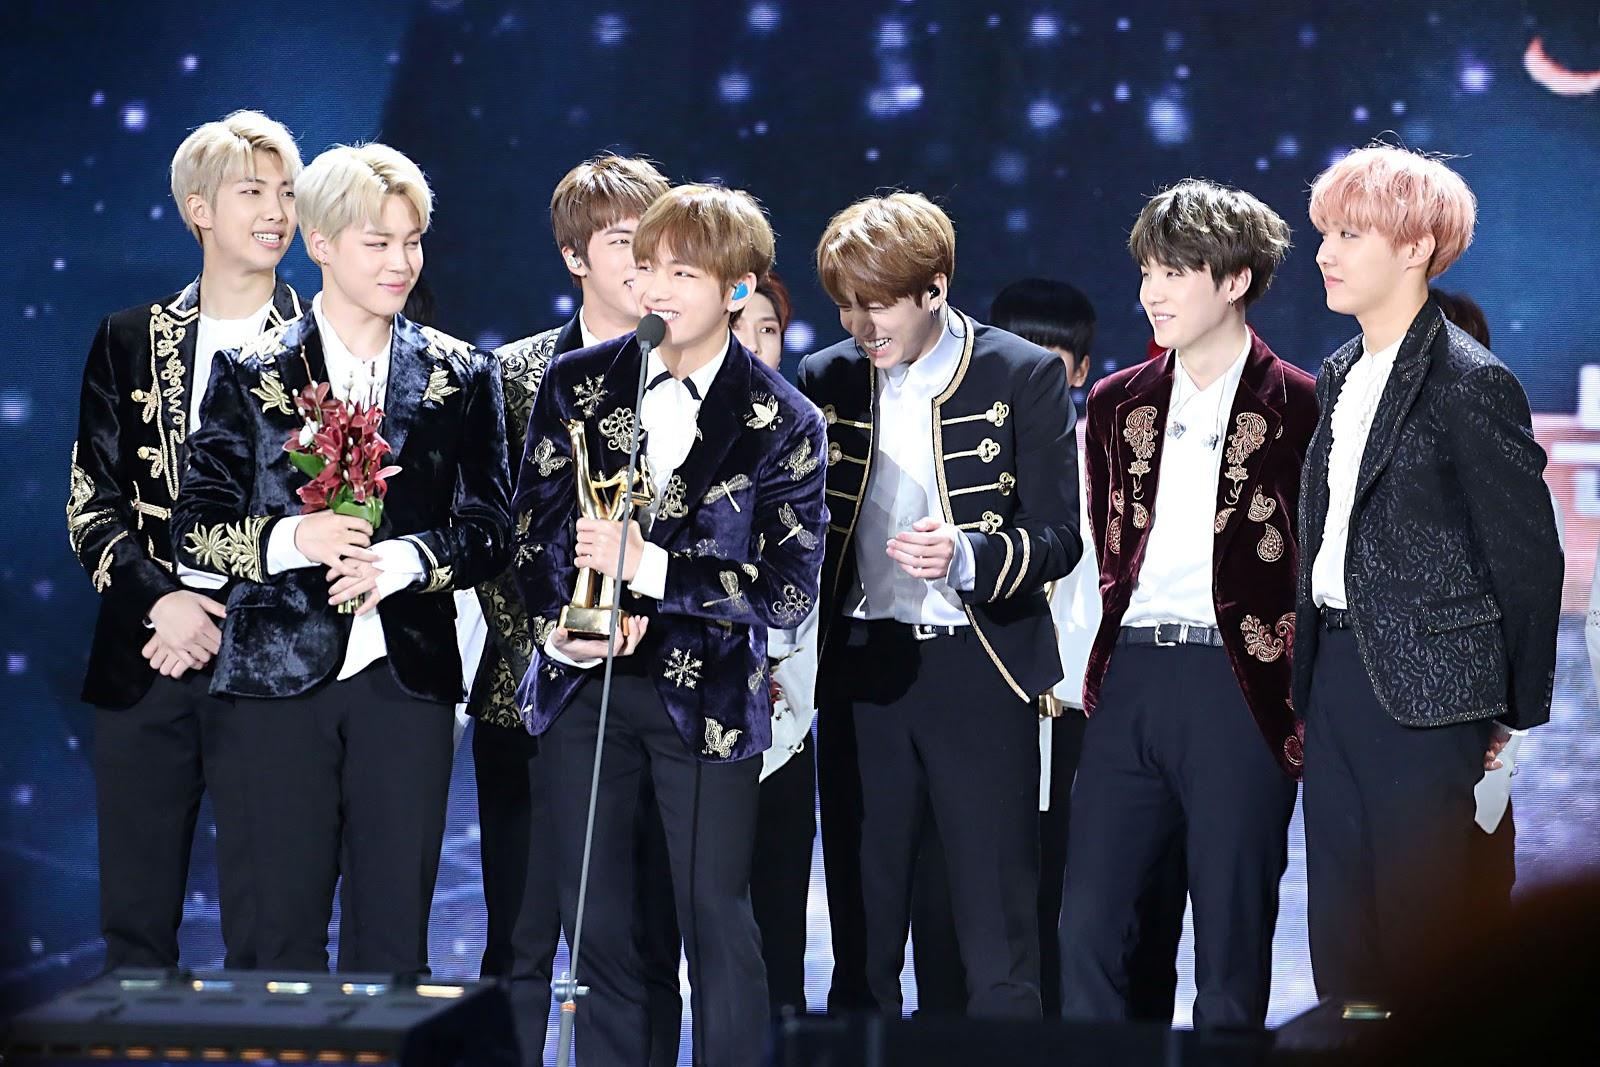 BTS_at_the_31st_Golden_Disk_Awards